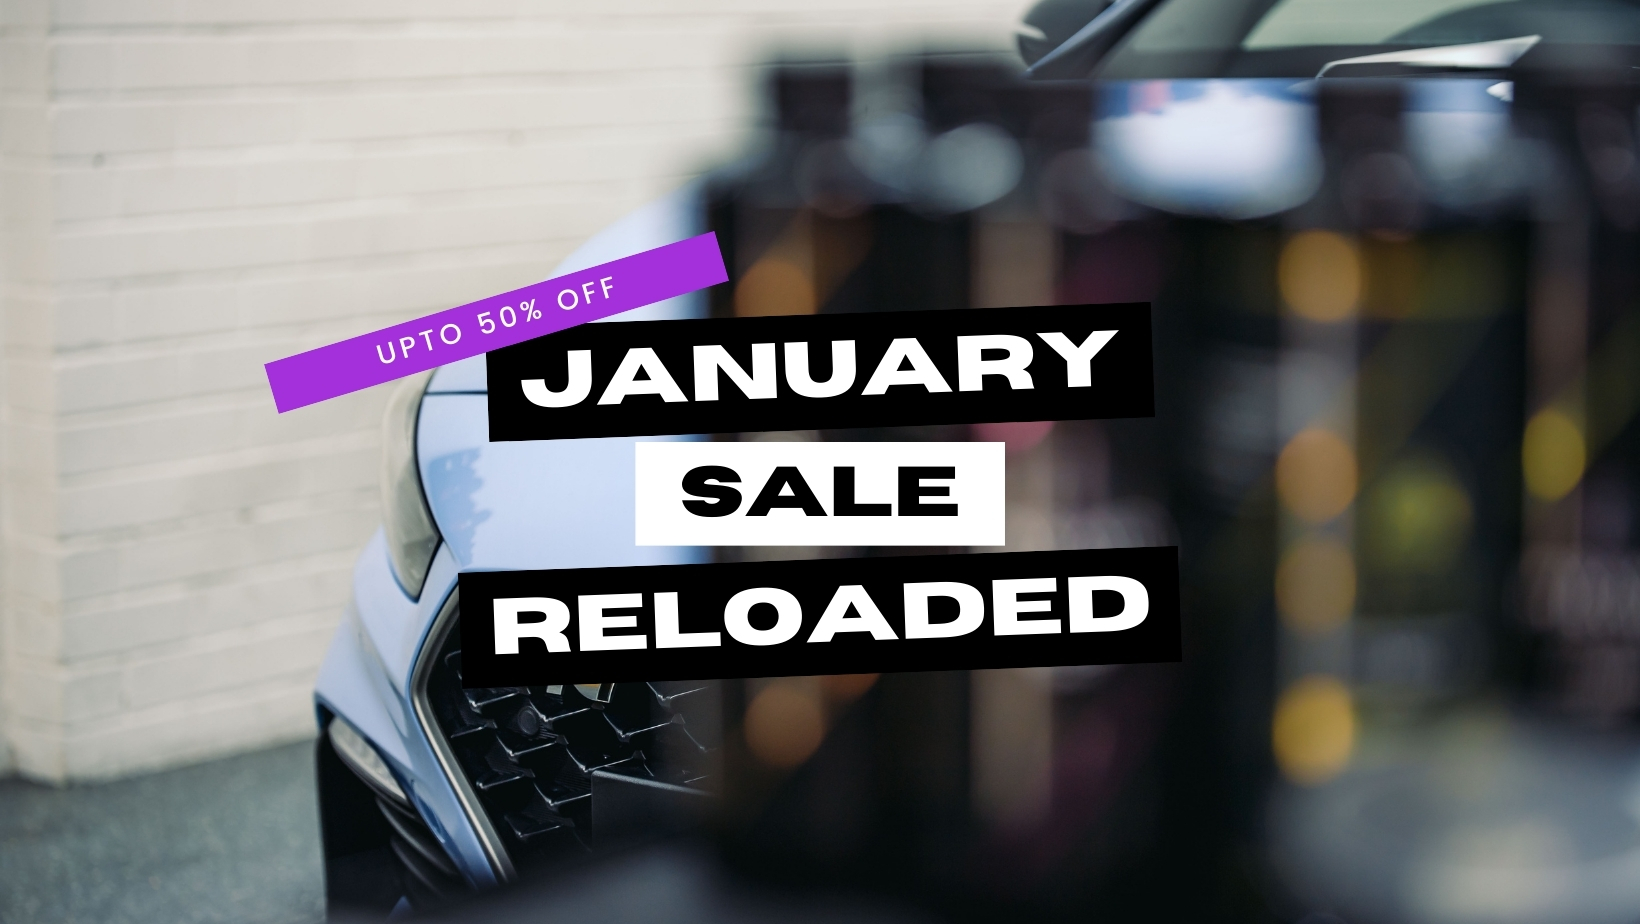 January Sale Reloaded